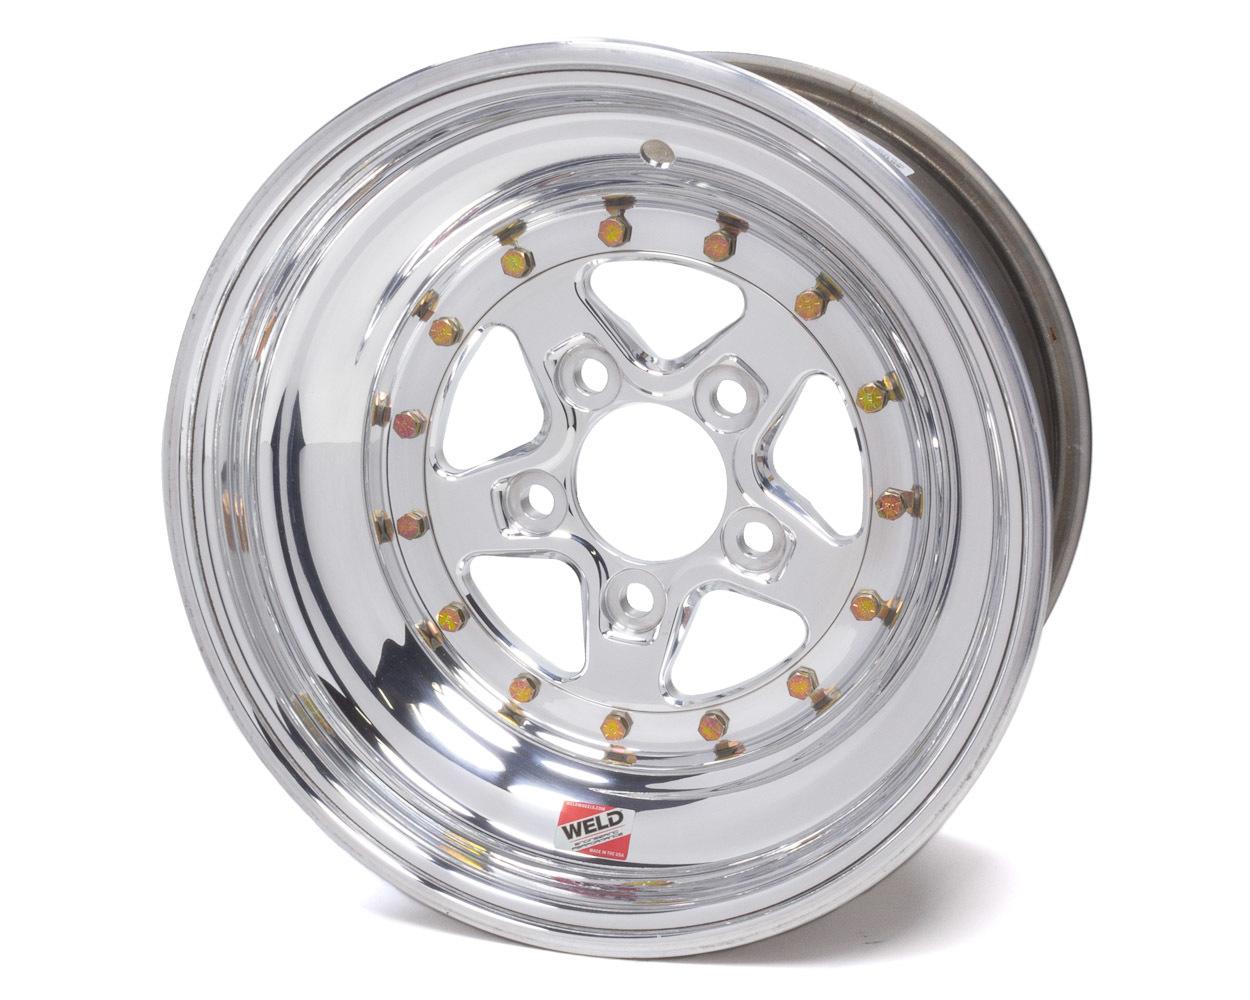 WELD RACING 15X8 Aluma Star 2.0 5X4.75 4.0 BS P/N - 88-508278